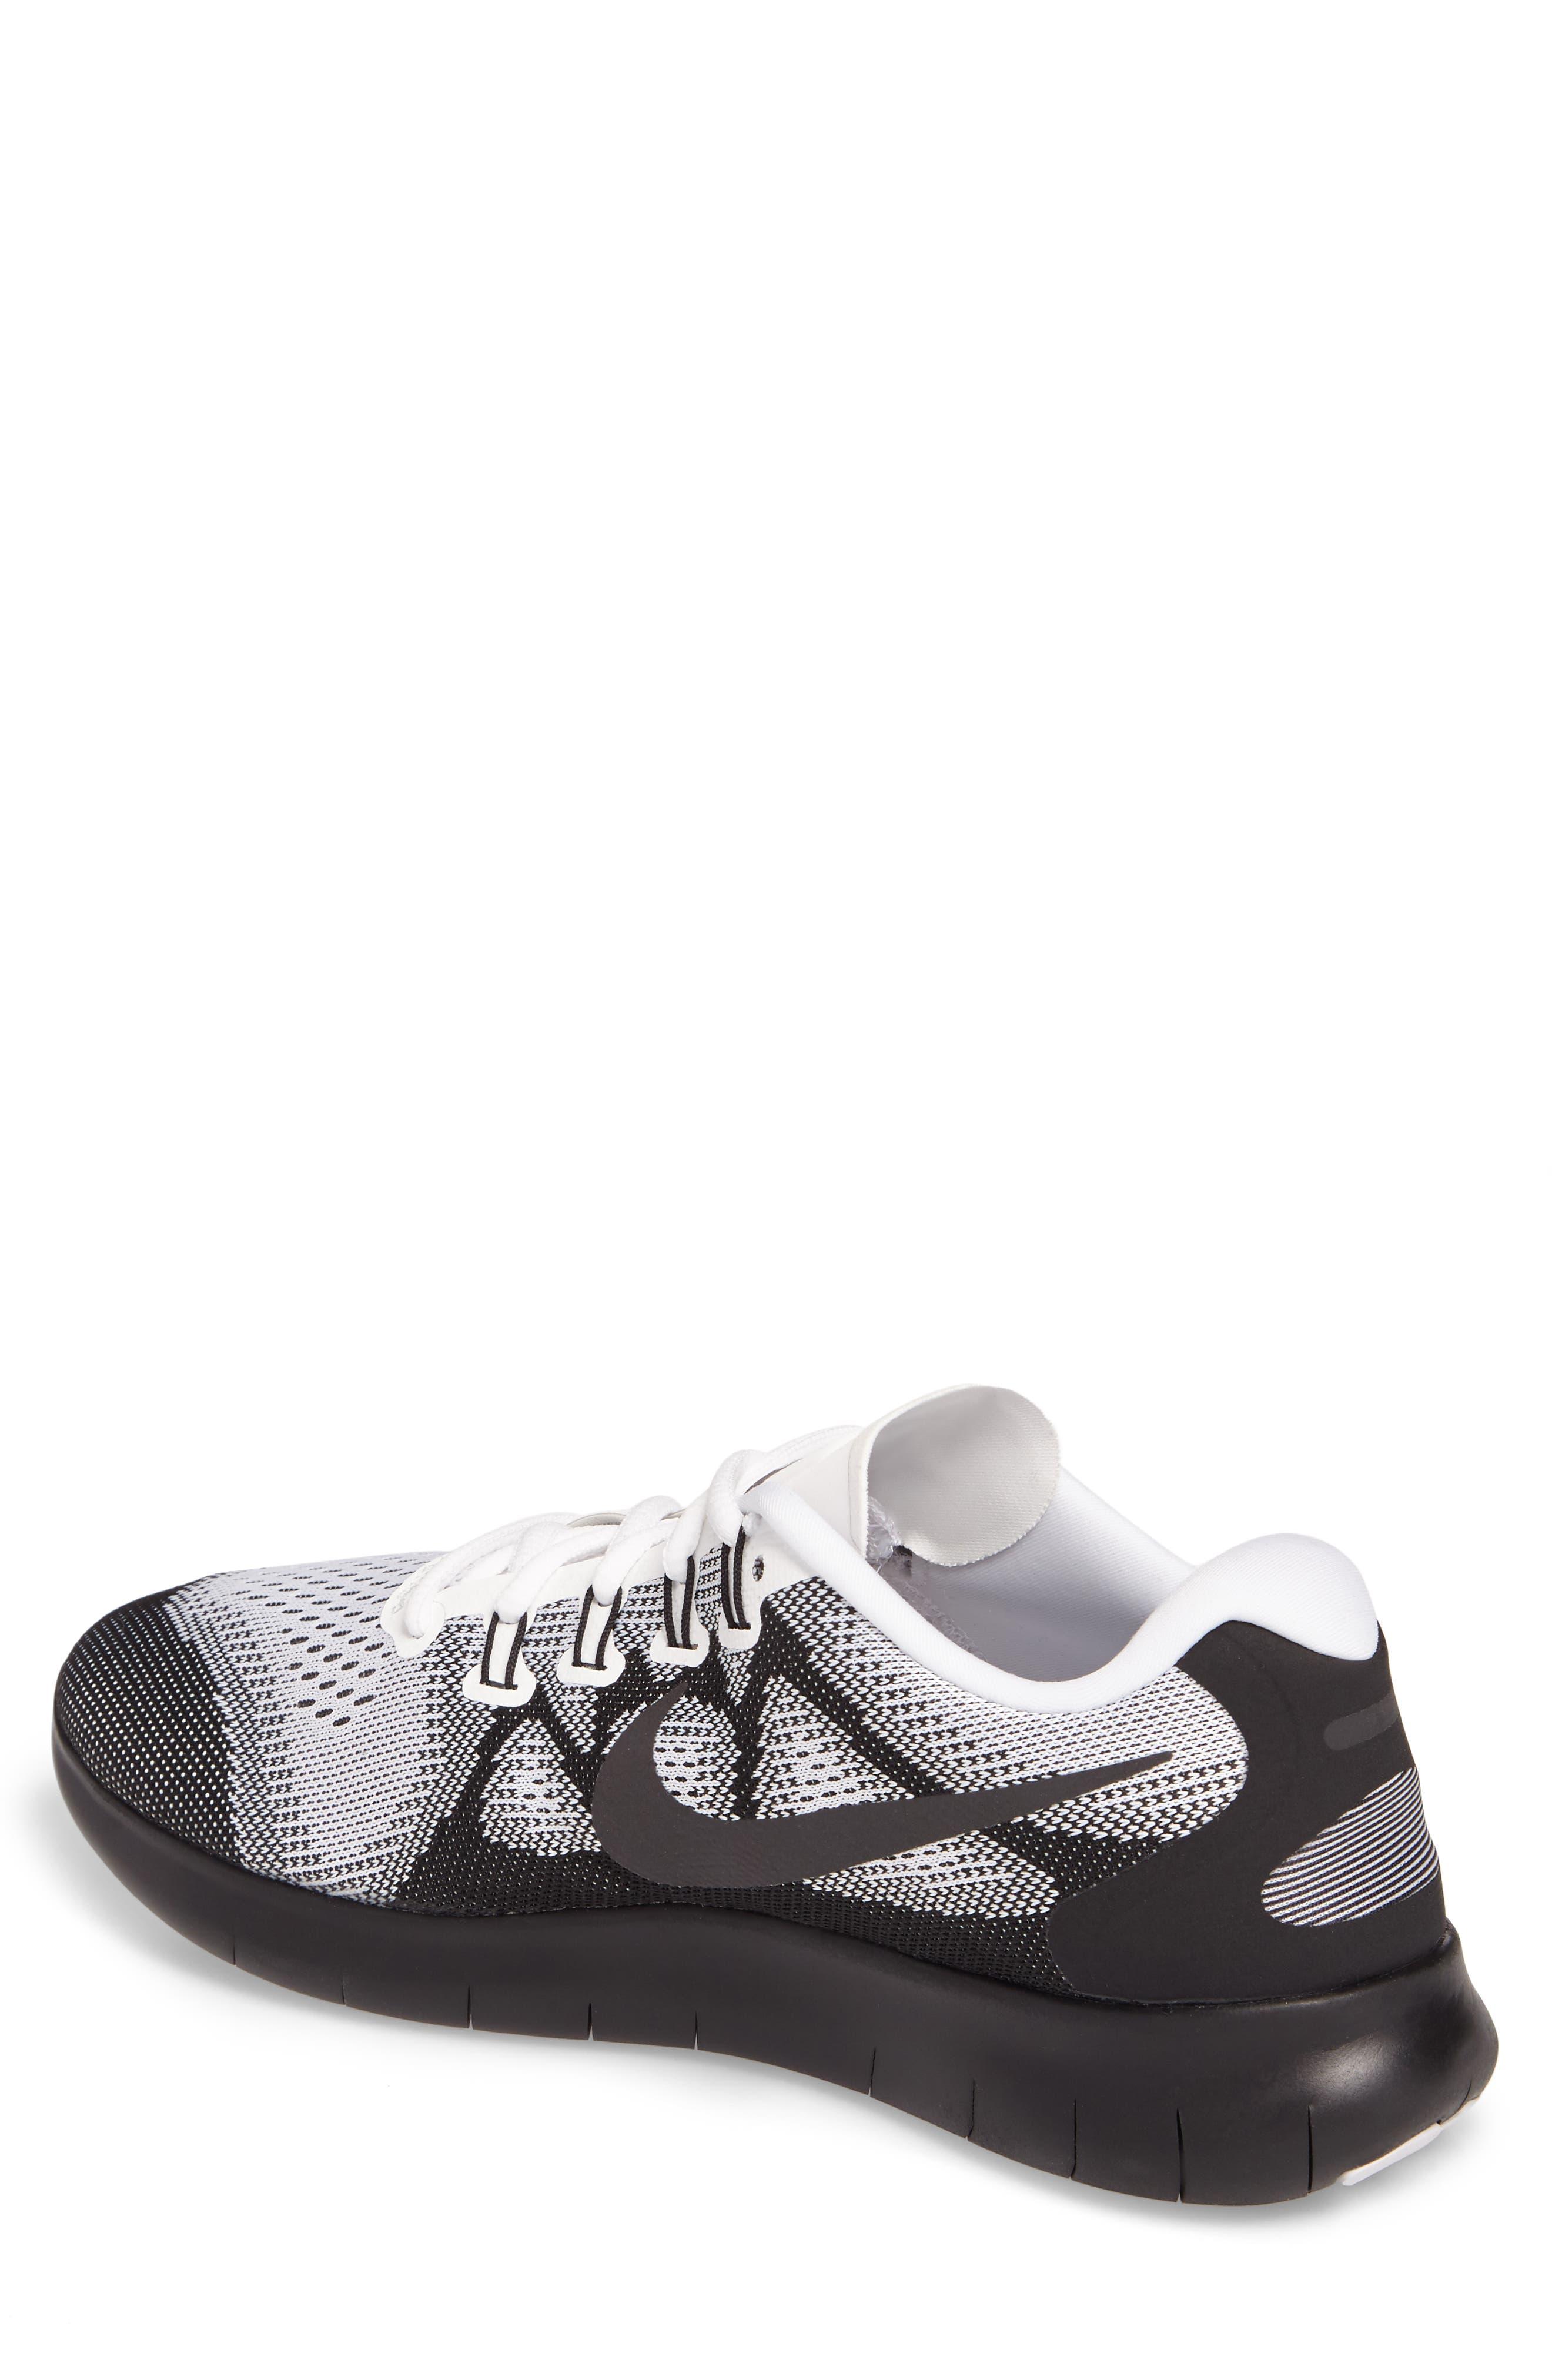 Free RN 2017 LE Running Shoe,                             Alternate thumbnail 2, color,                             Black/Black/White